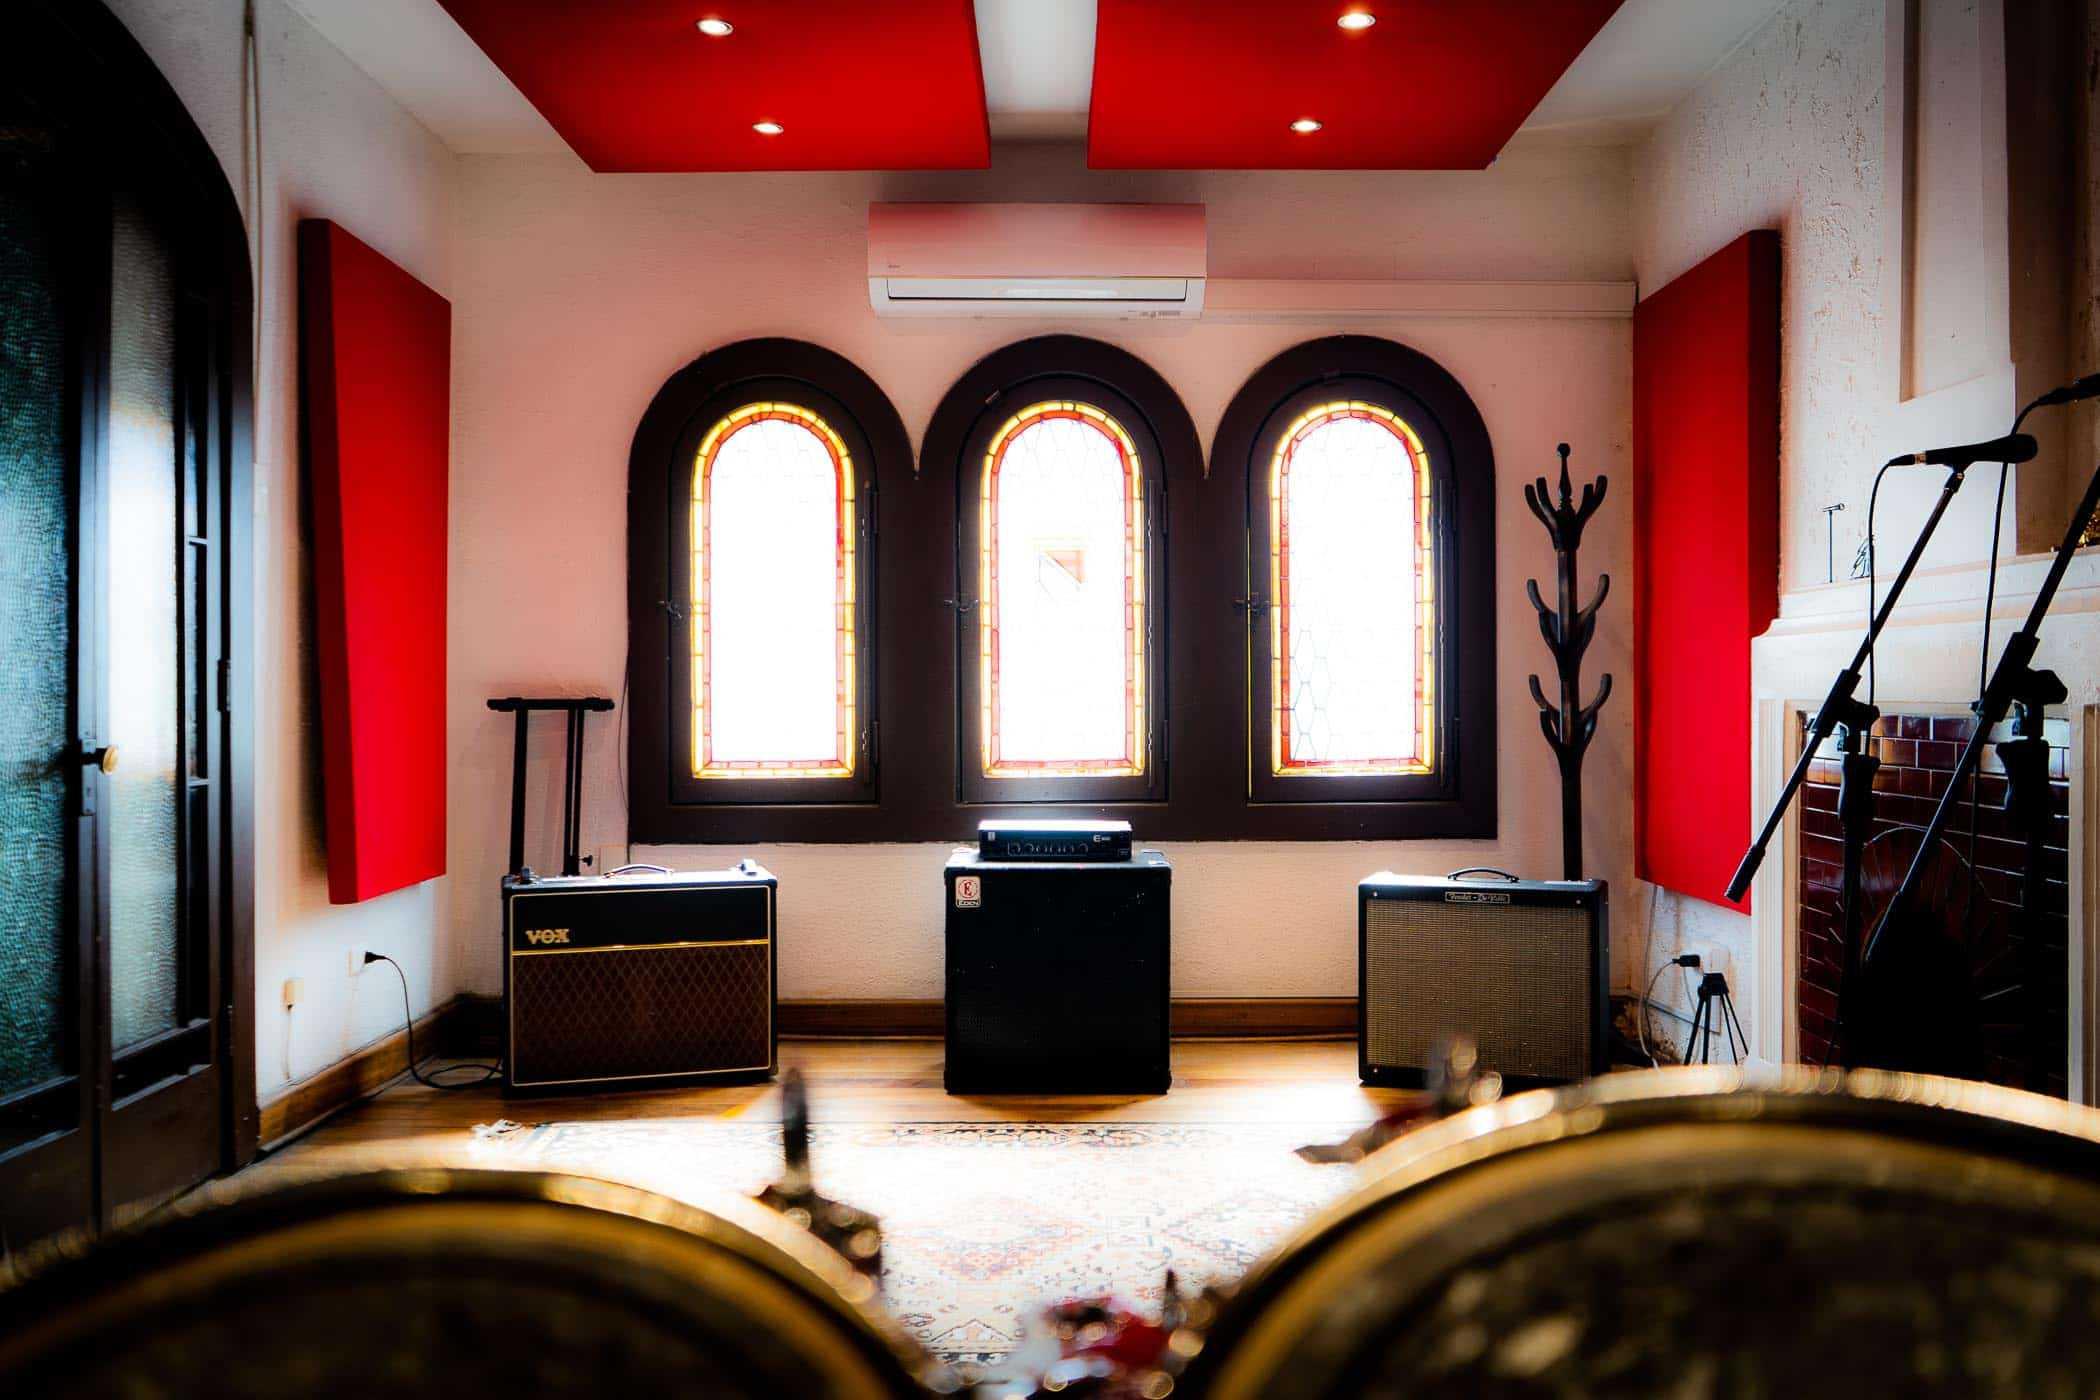 Sala de Ensayo El Living - Plan mensual 8 hrs